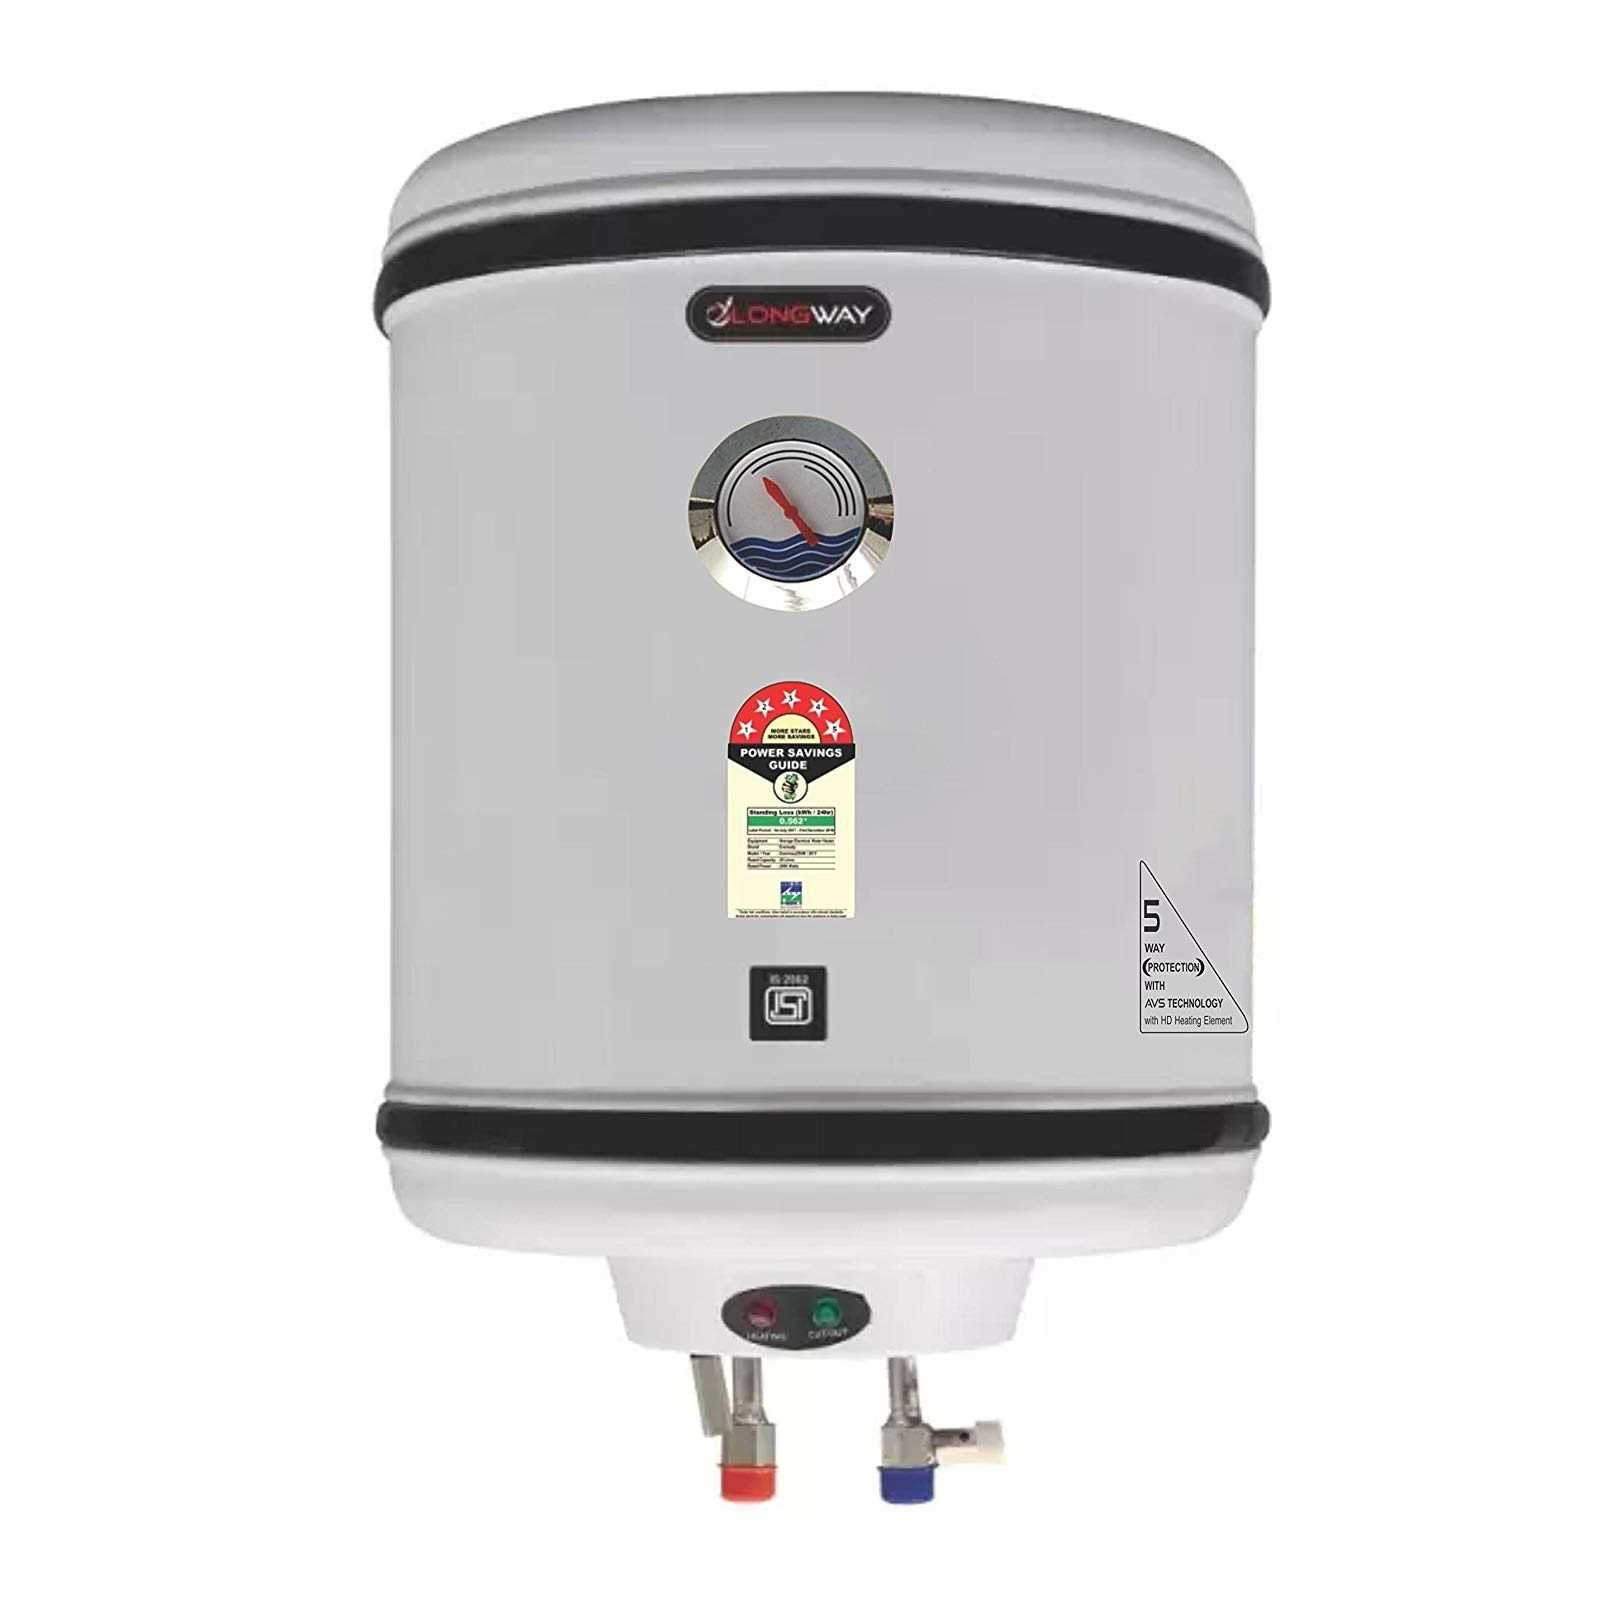 Longway Hotstar 25 Litre Storage Water Heater